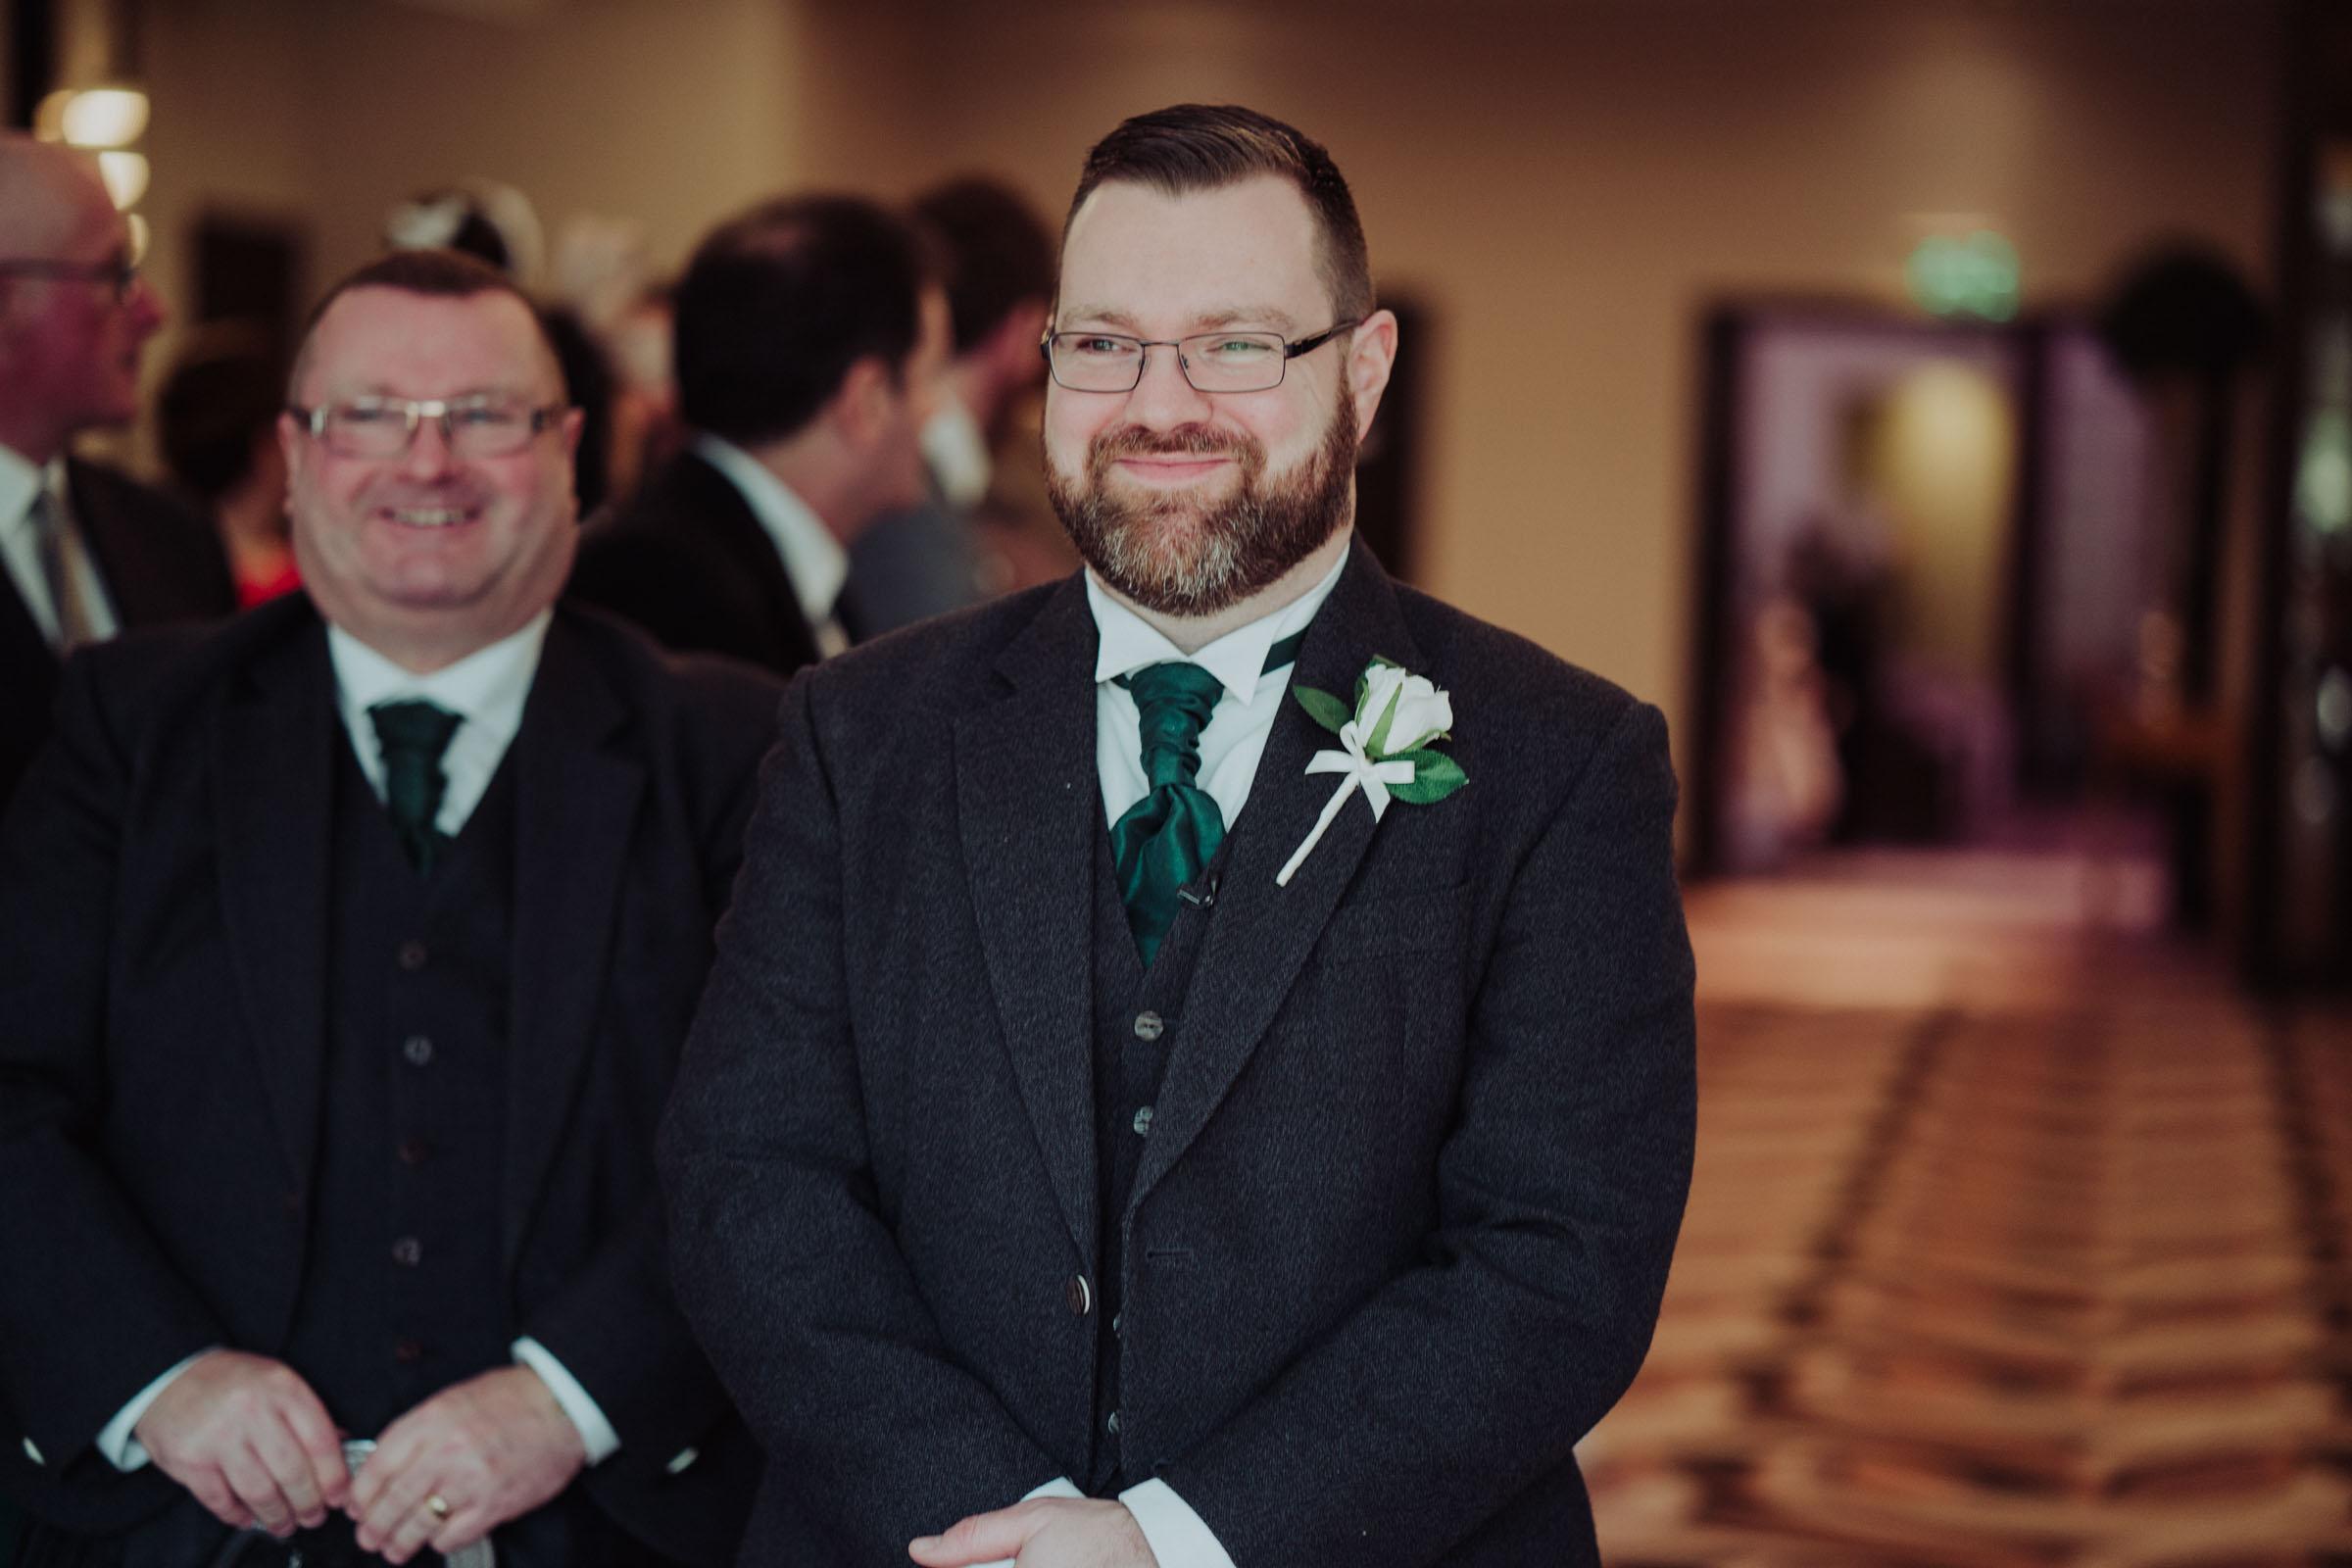 Radstone-Wedding-Dearly-Photography-Scotland (7 of 50).jpg